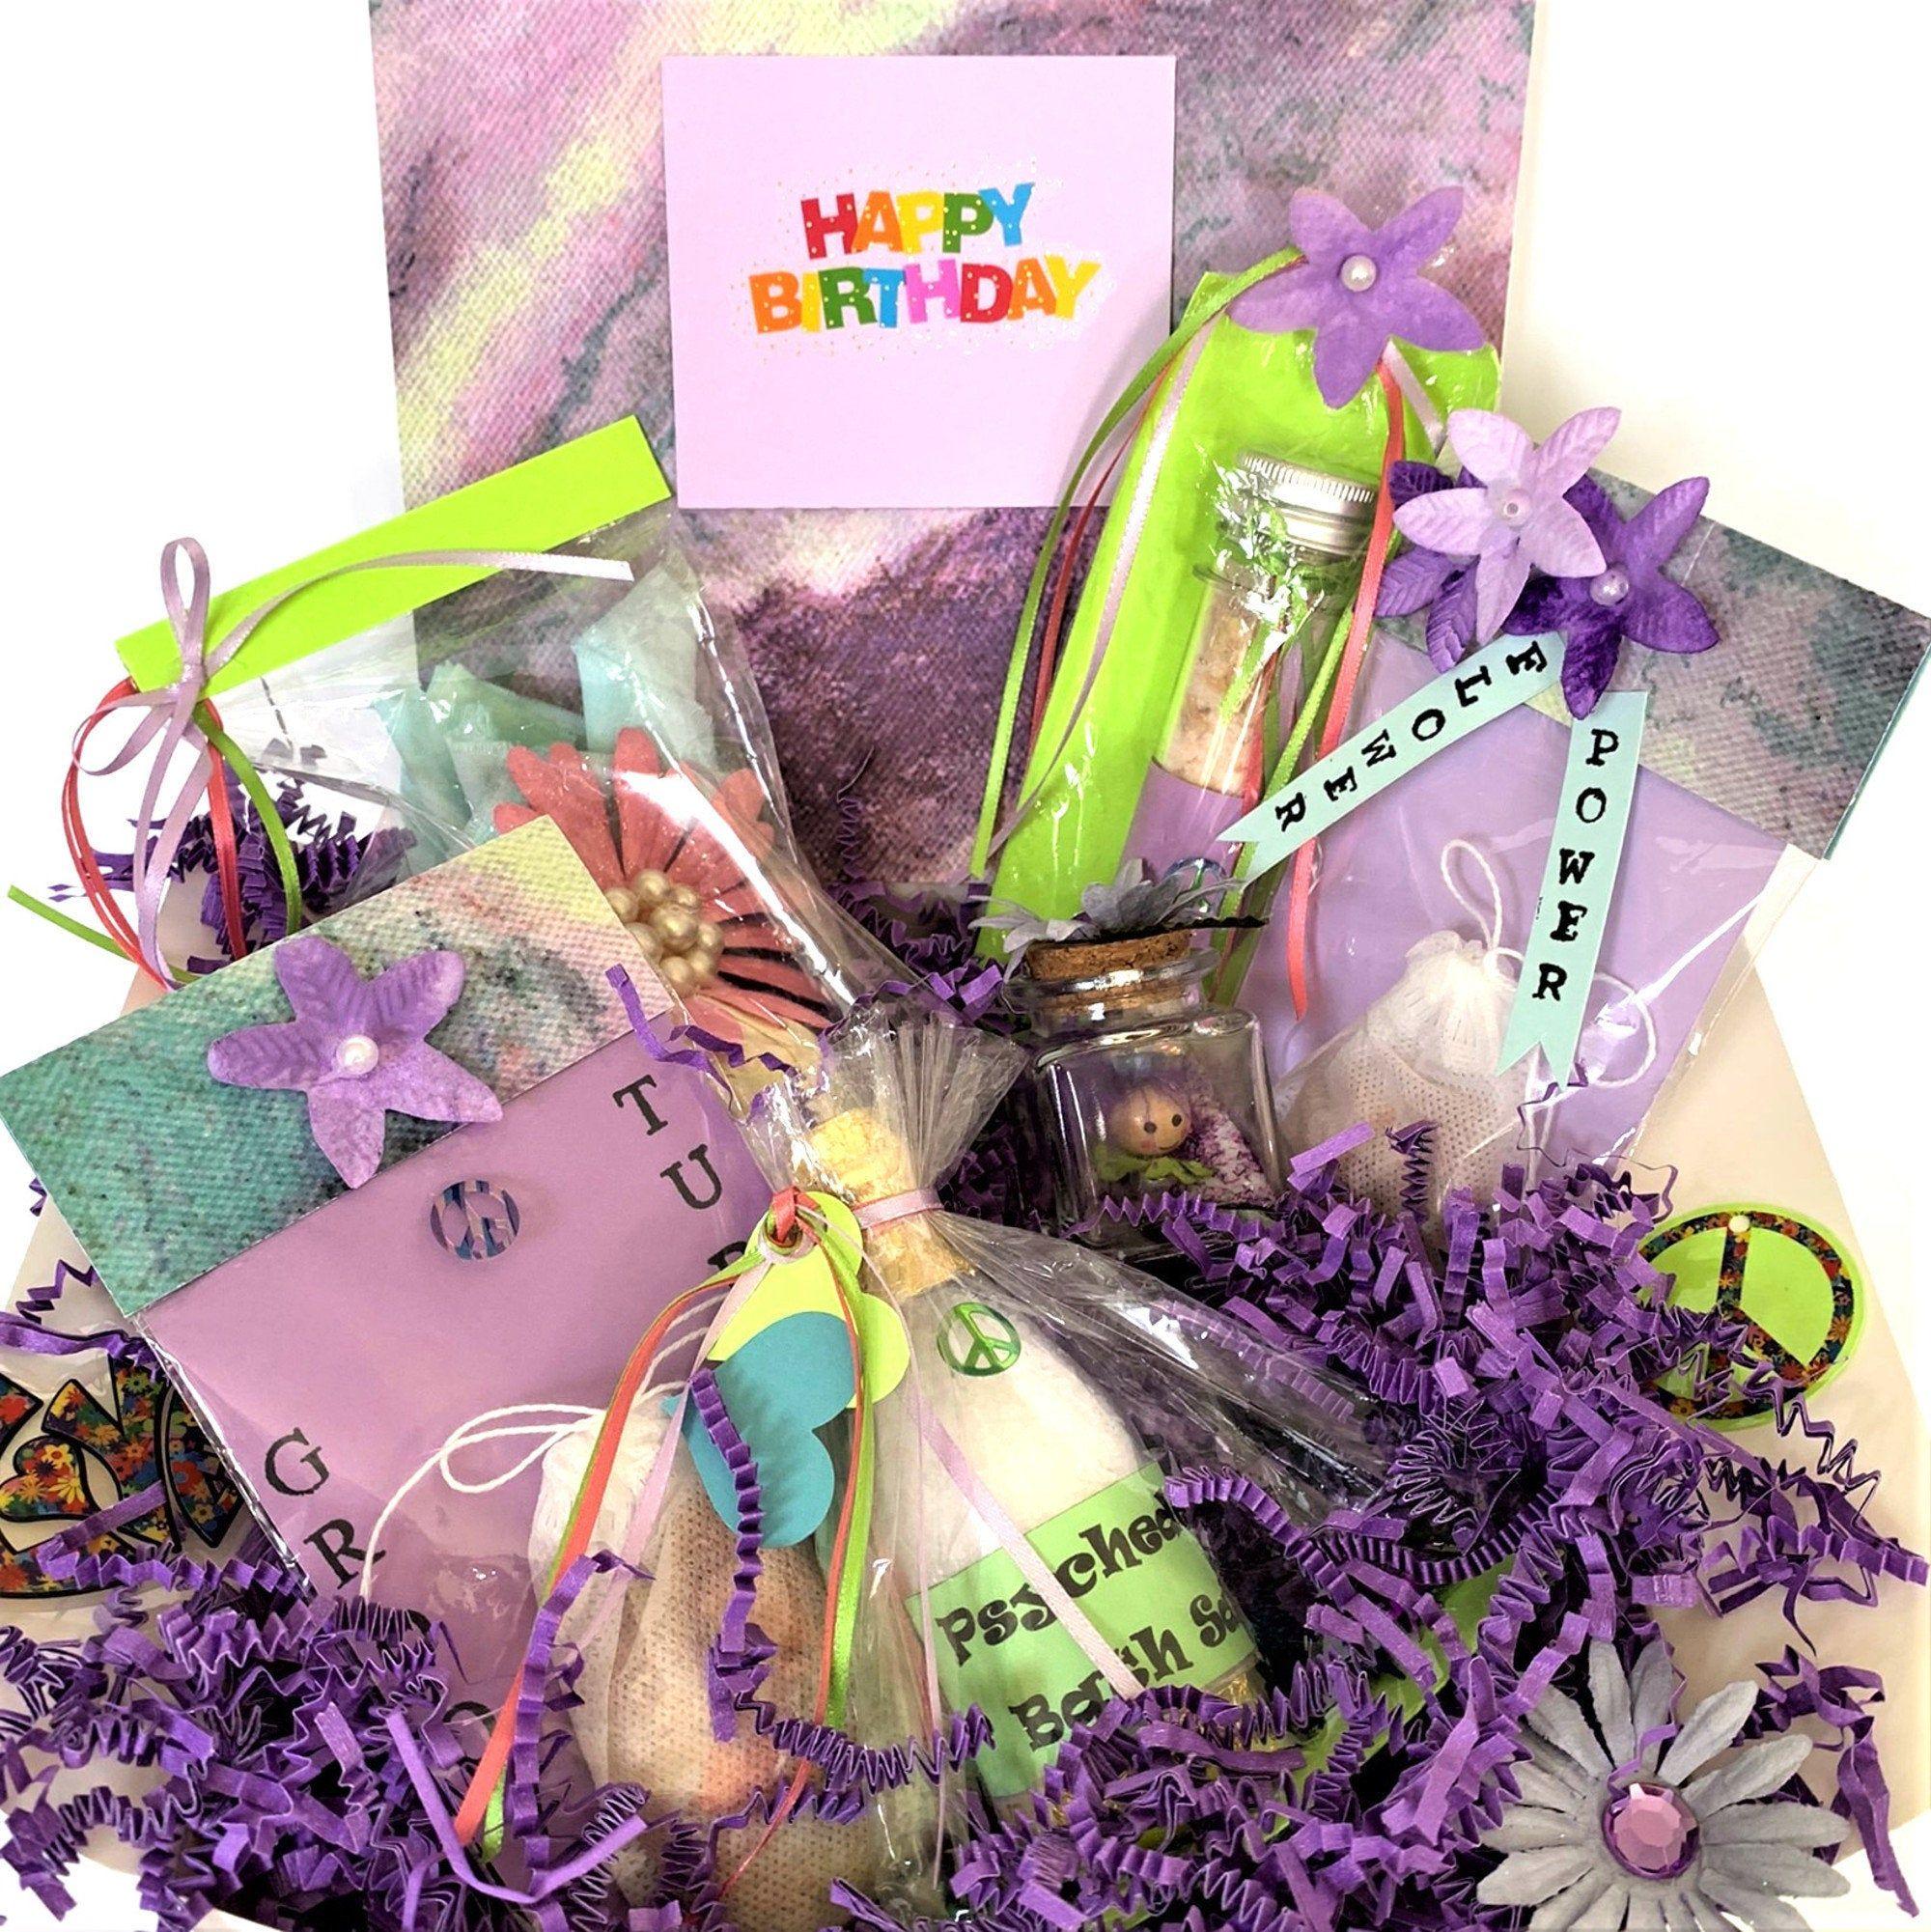 60th birthday gift flower power birthday box funny gift